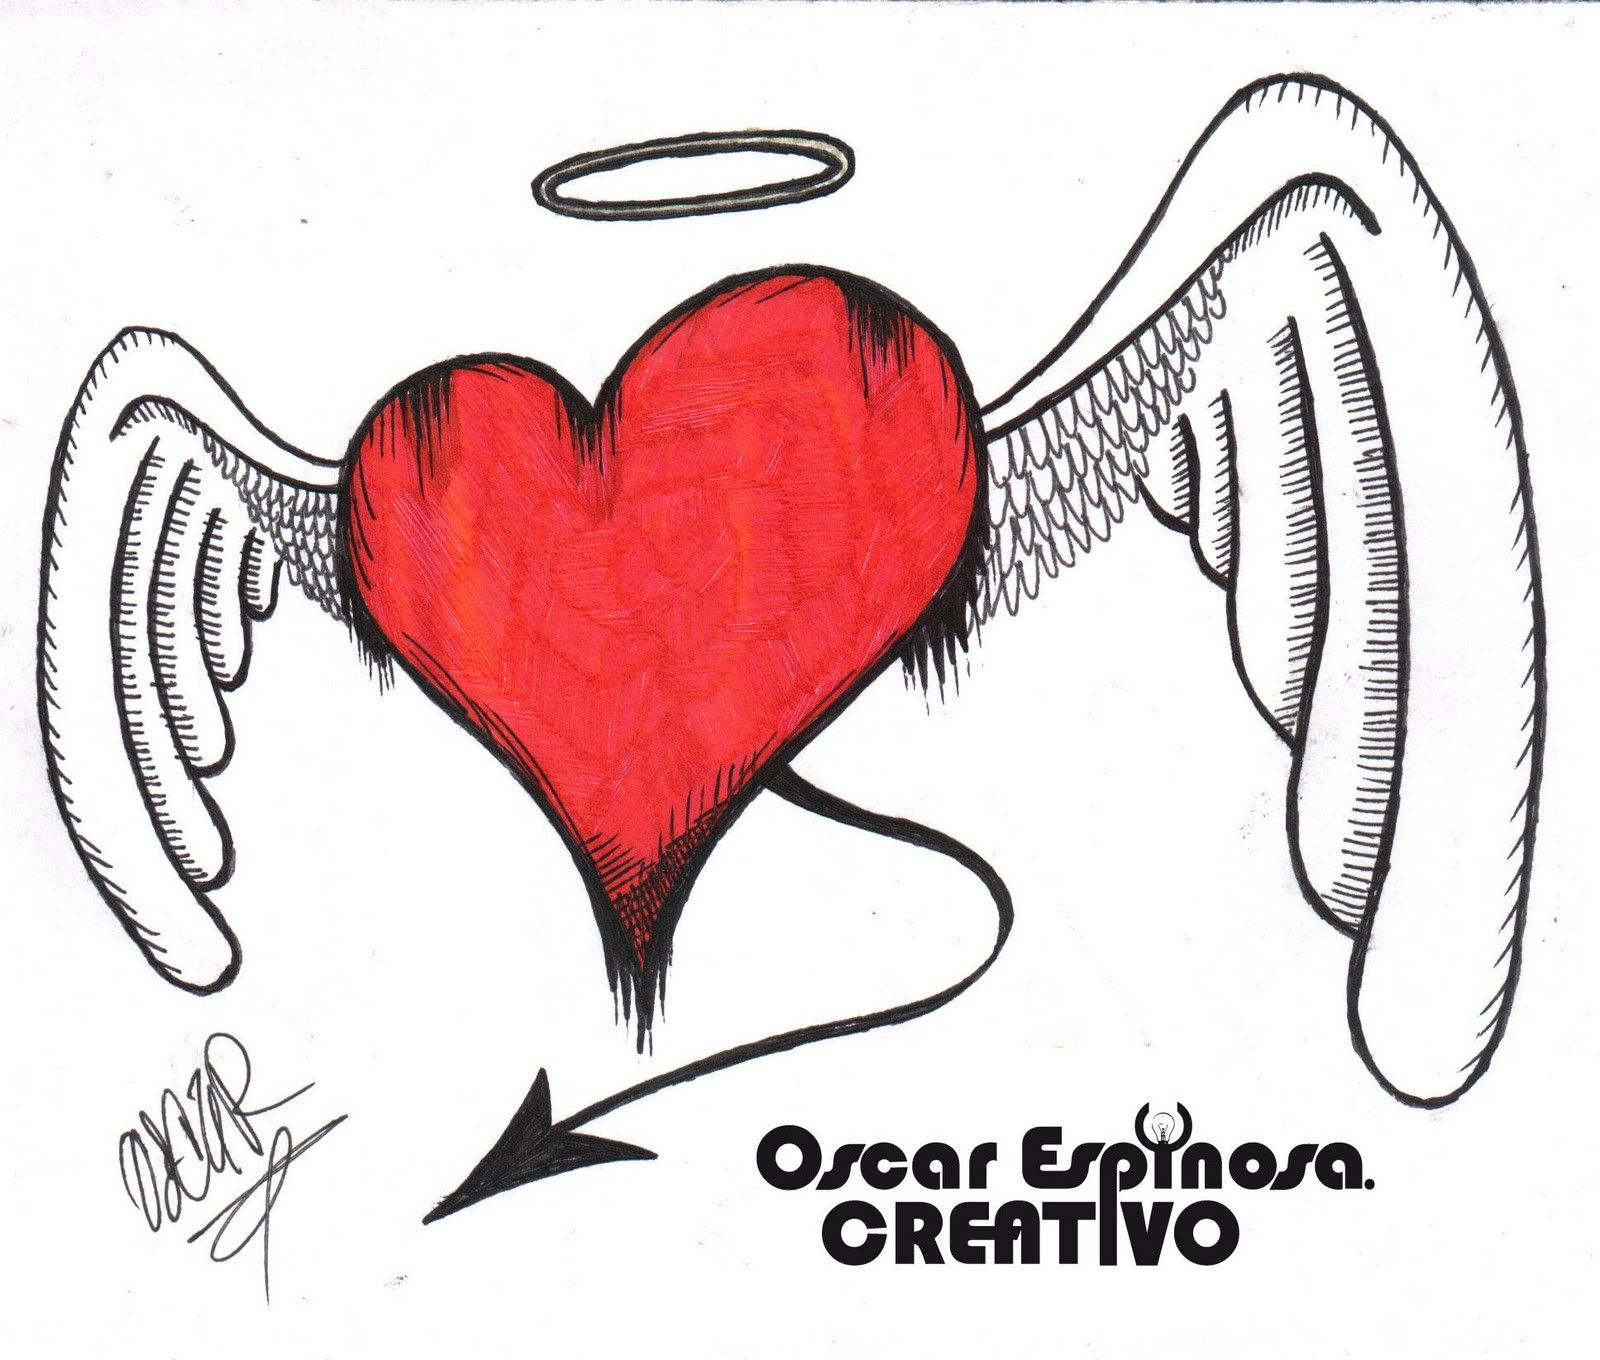 Dibujos A Lapiz De Corazones Con Alas | dibujos | Pinterest | Alas ...